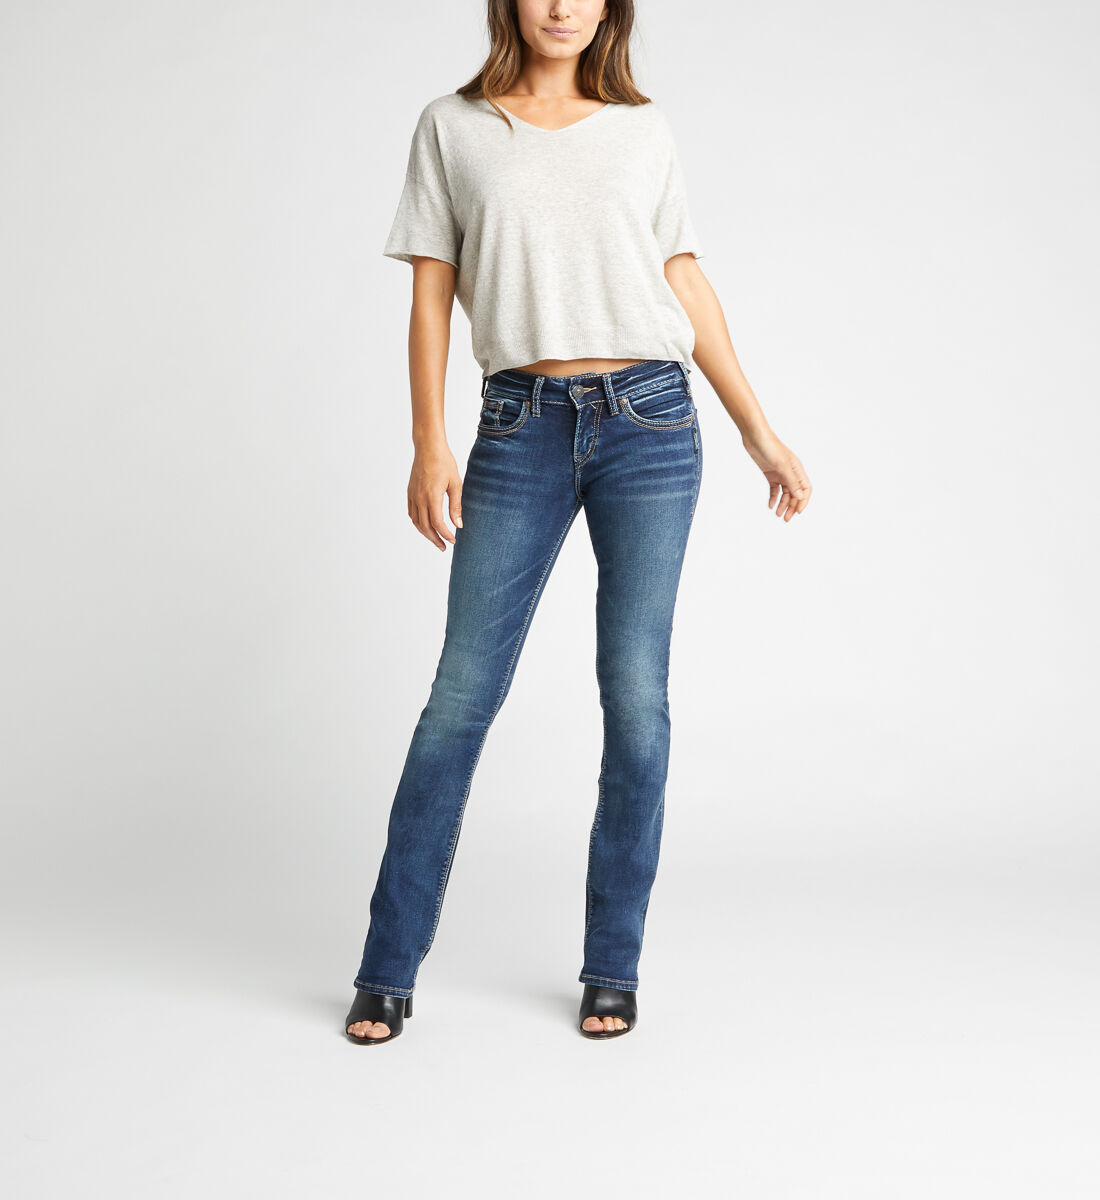 Suki Mid Rise Slim Bootcut Jeans,Indigo Alt Image 1